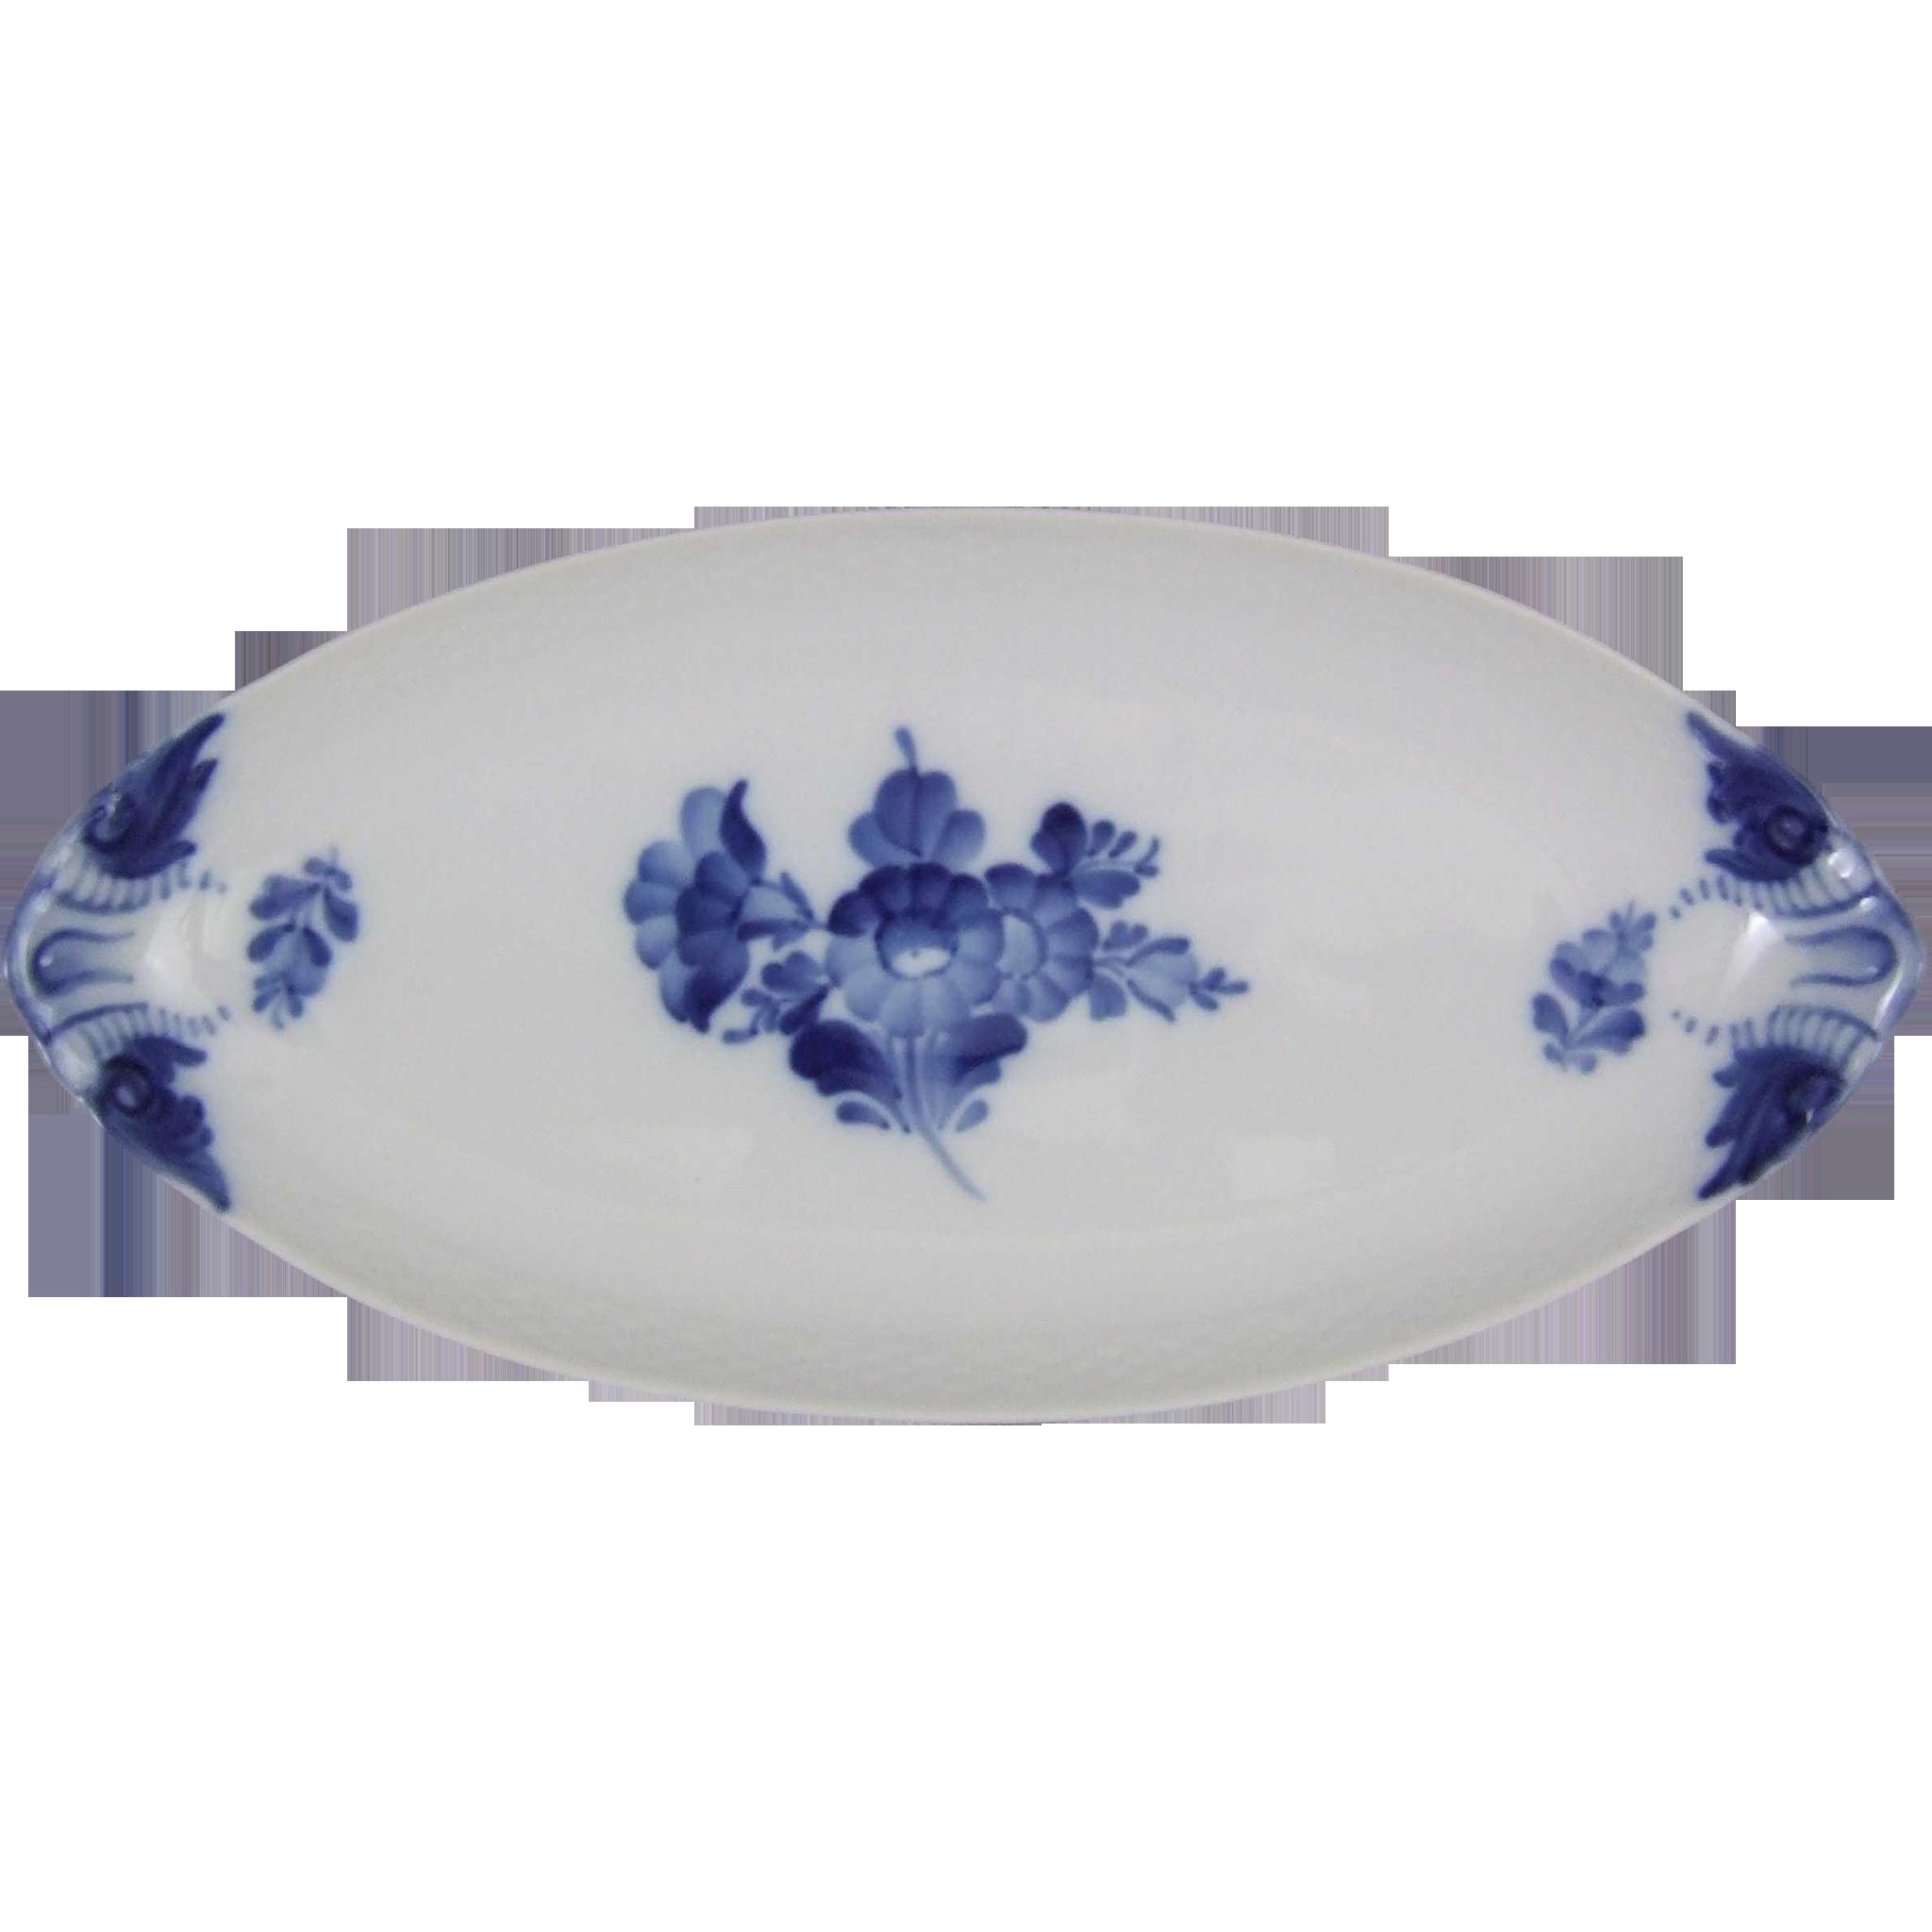 Royal Copenhagen Blue Flower Braided Blaue Blume 353 Dish